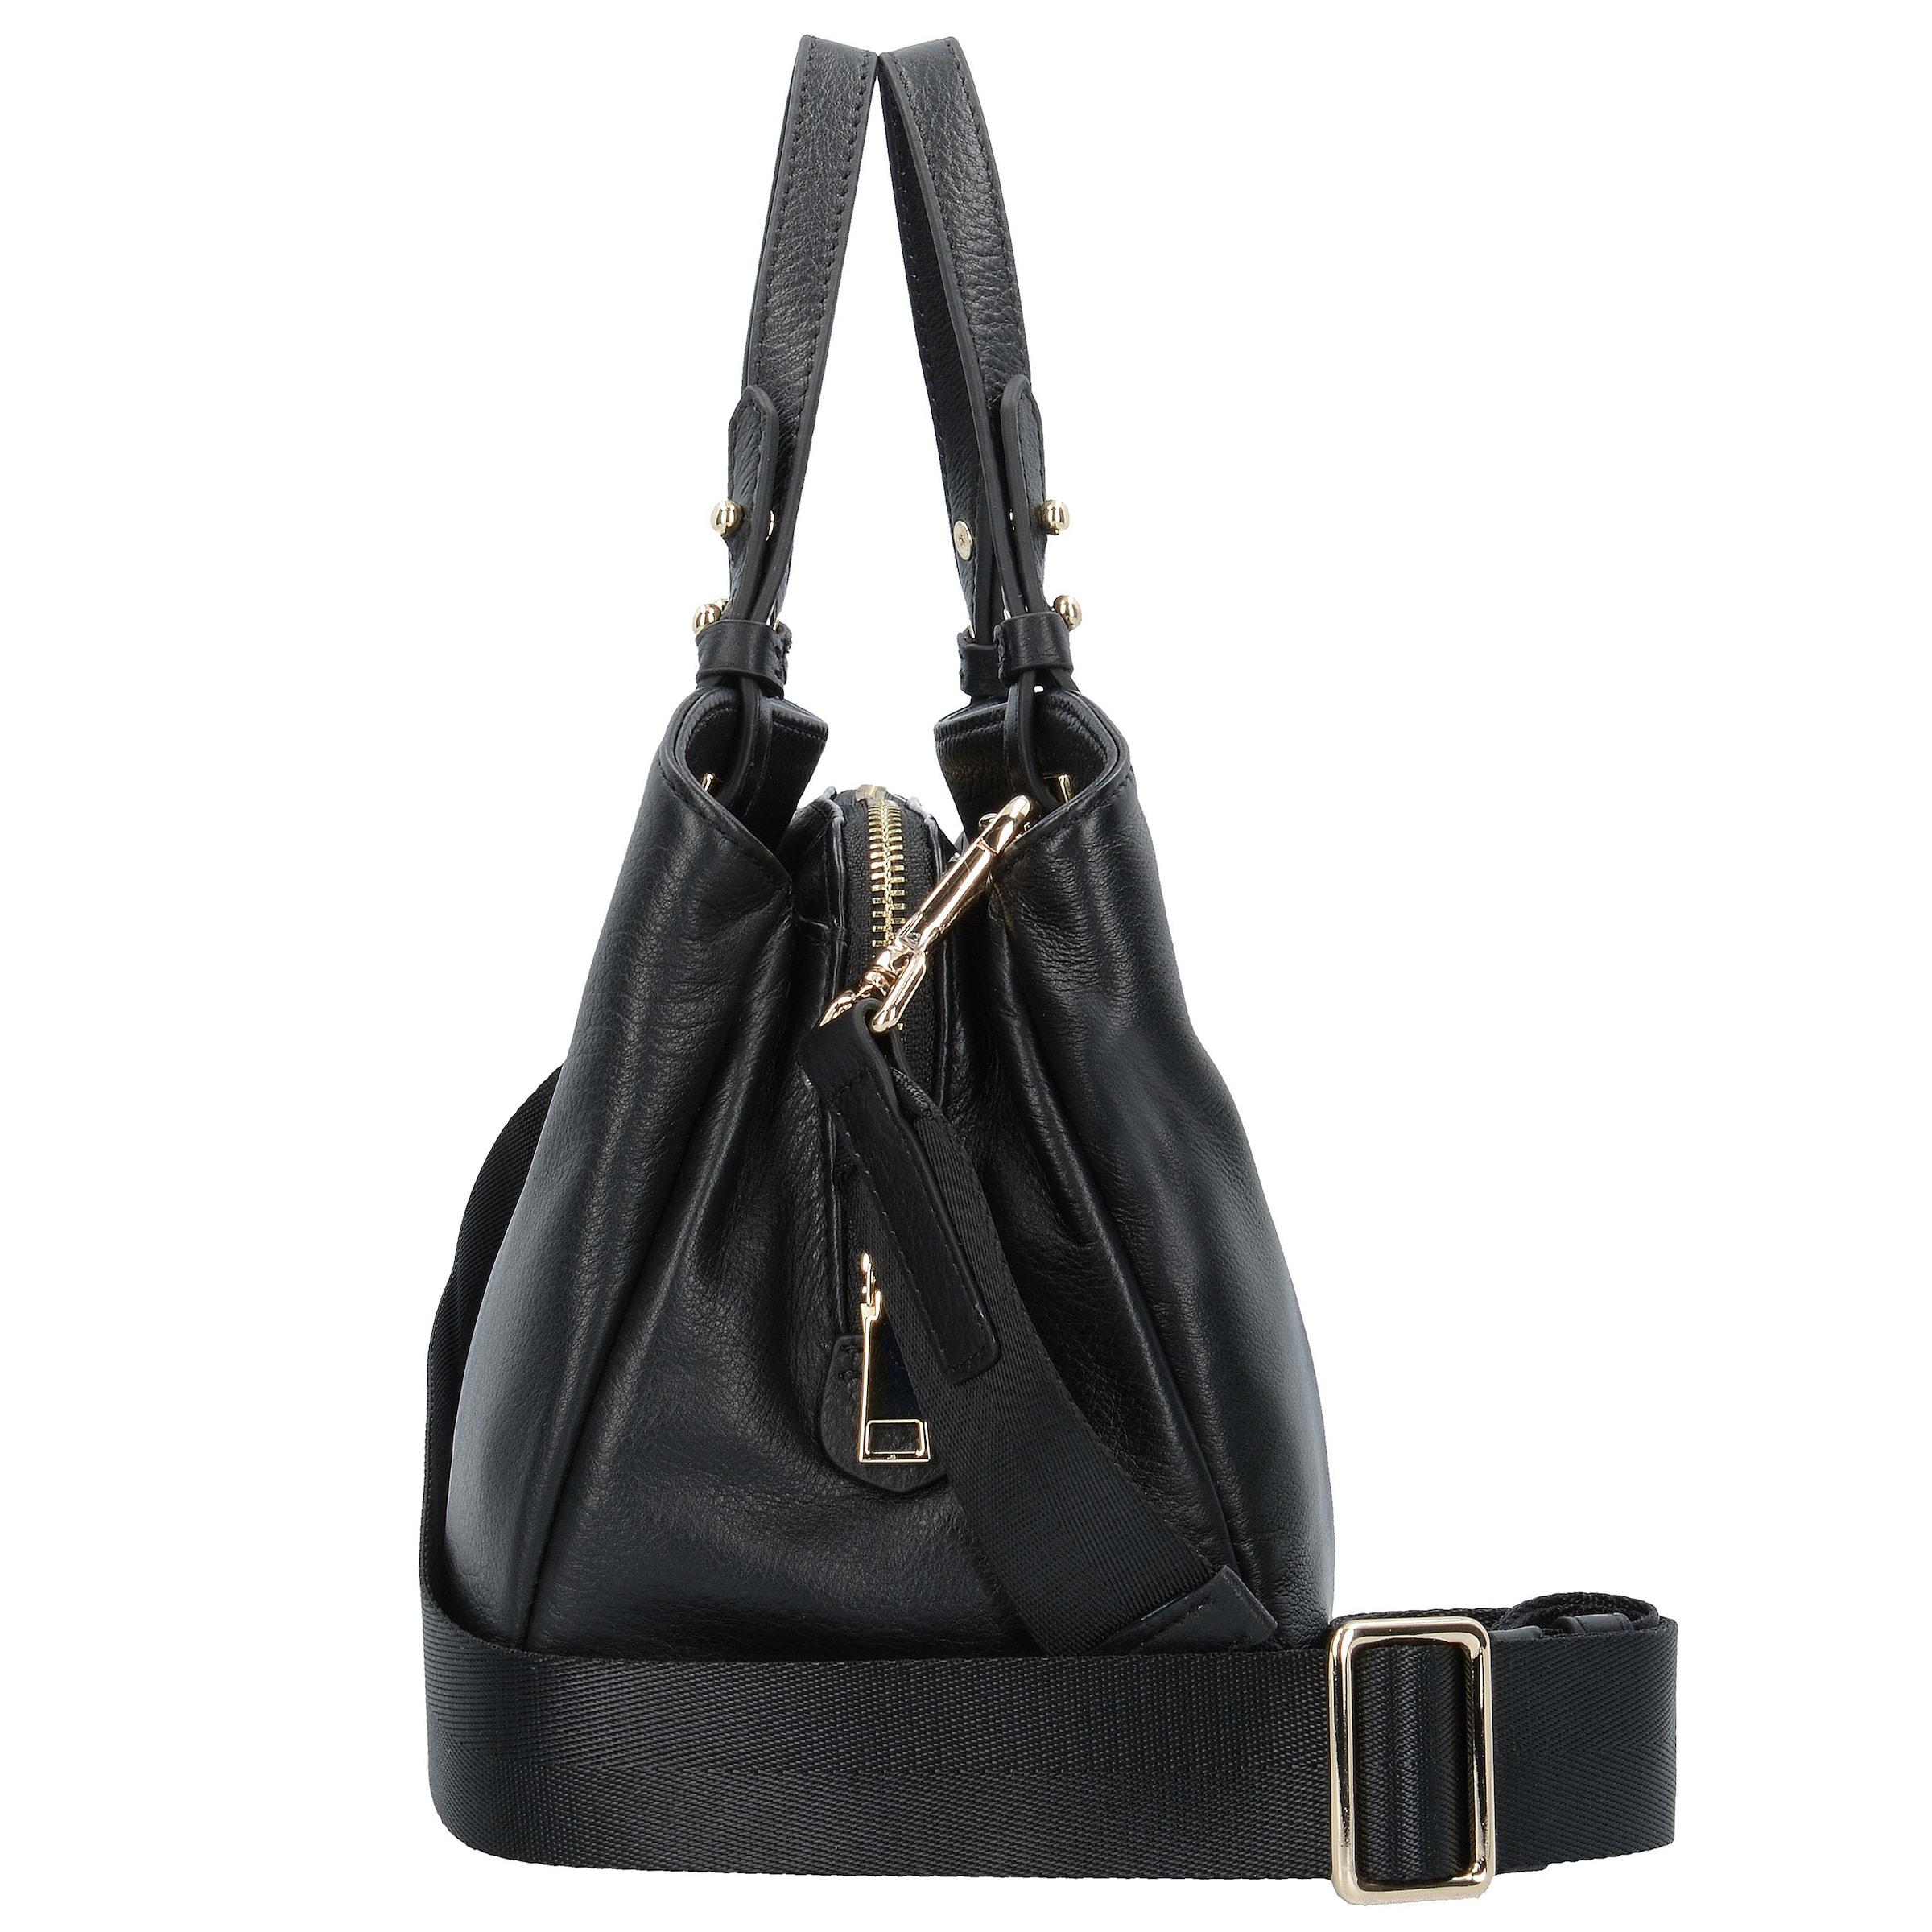 CINQUE Elisa Handtasche aus Leder, 28 cm